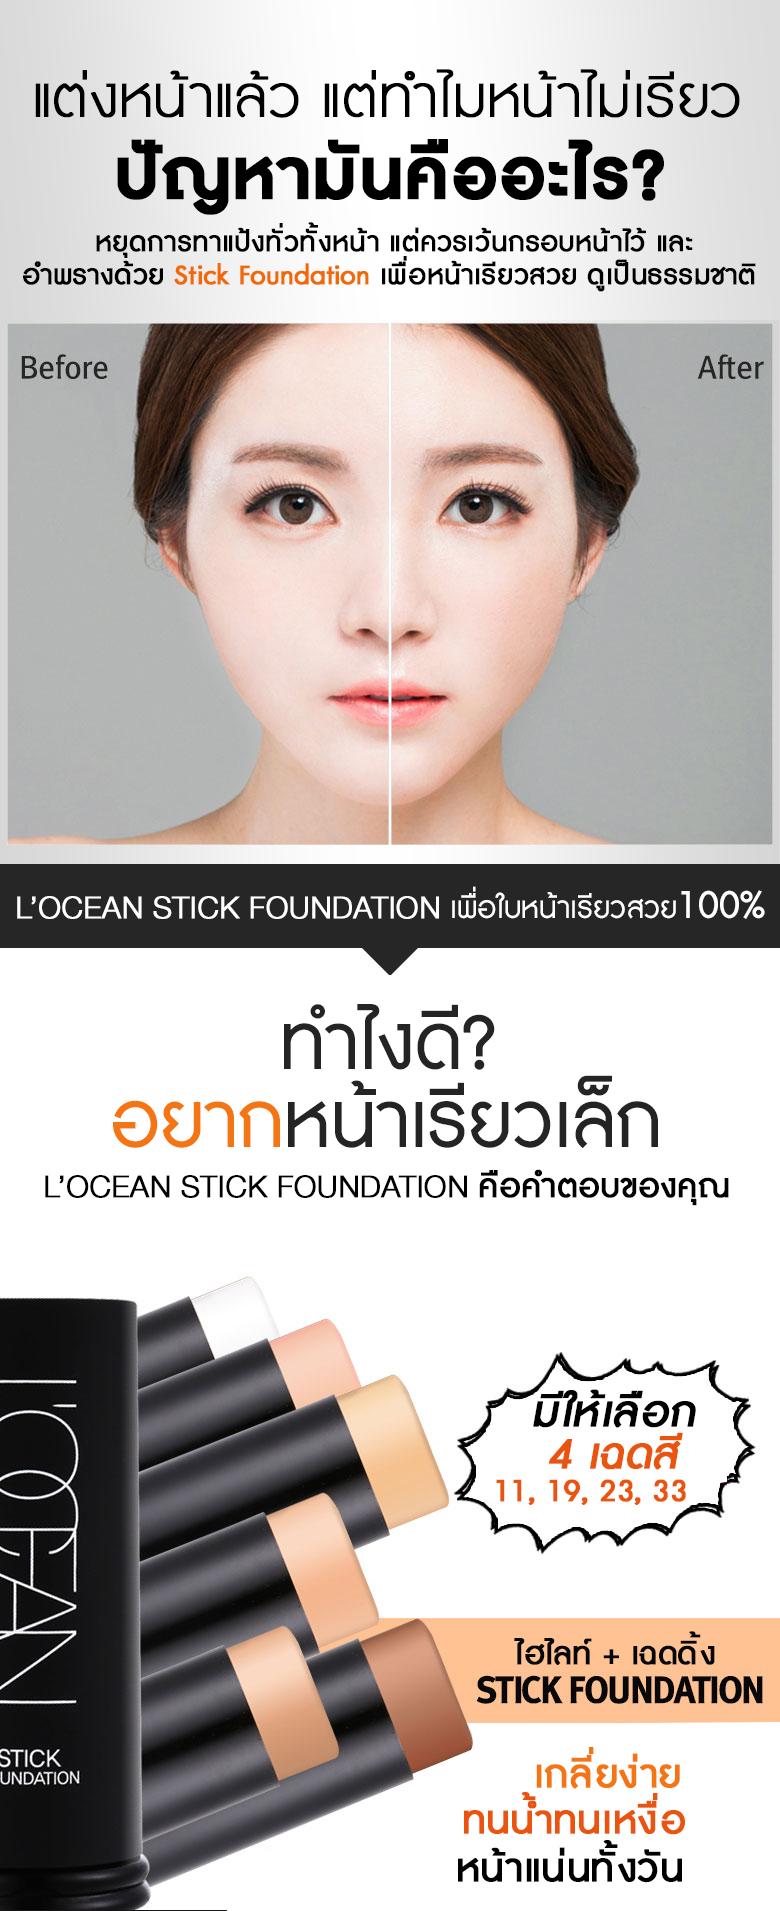 Locean Stick Foundation